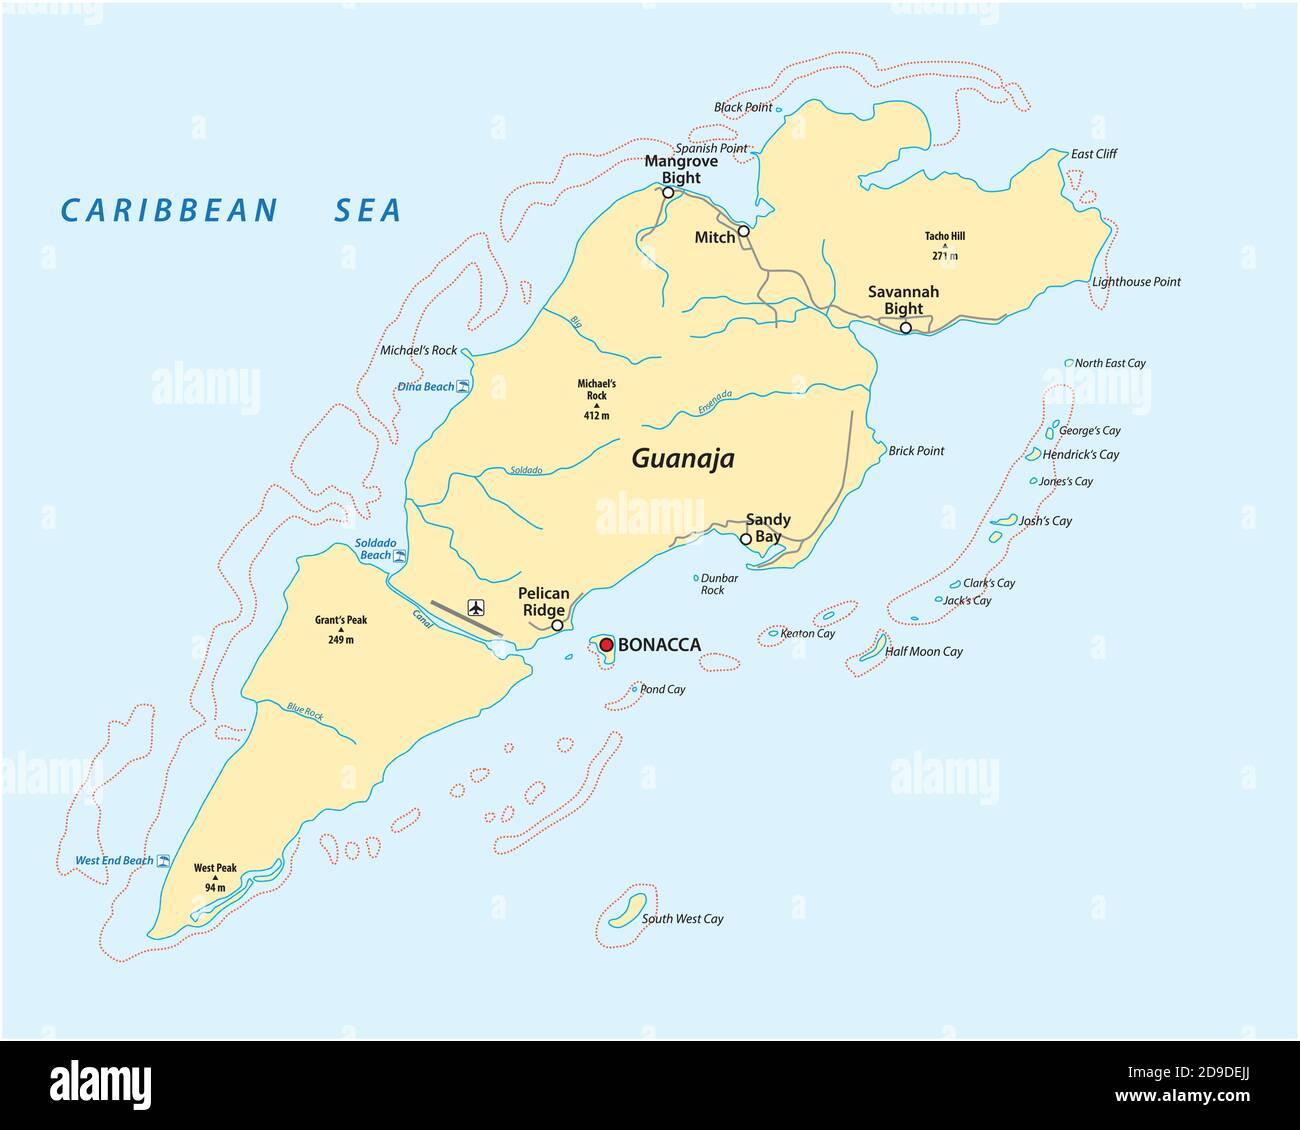 vektorkarte der honduranischen Karibikinsel Guanaja, Honduras Stock Vektor